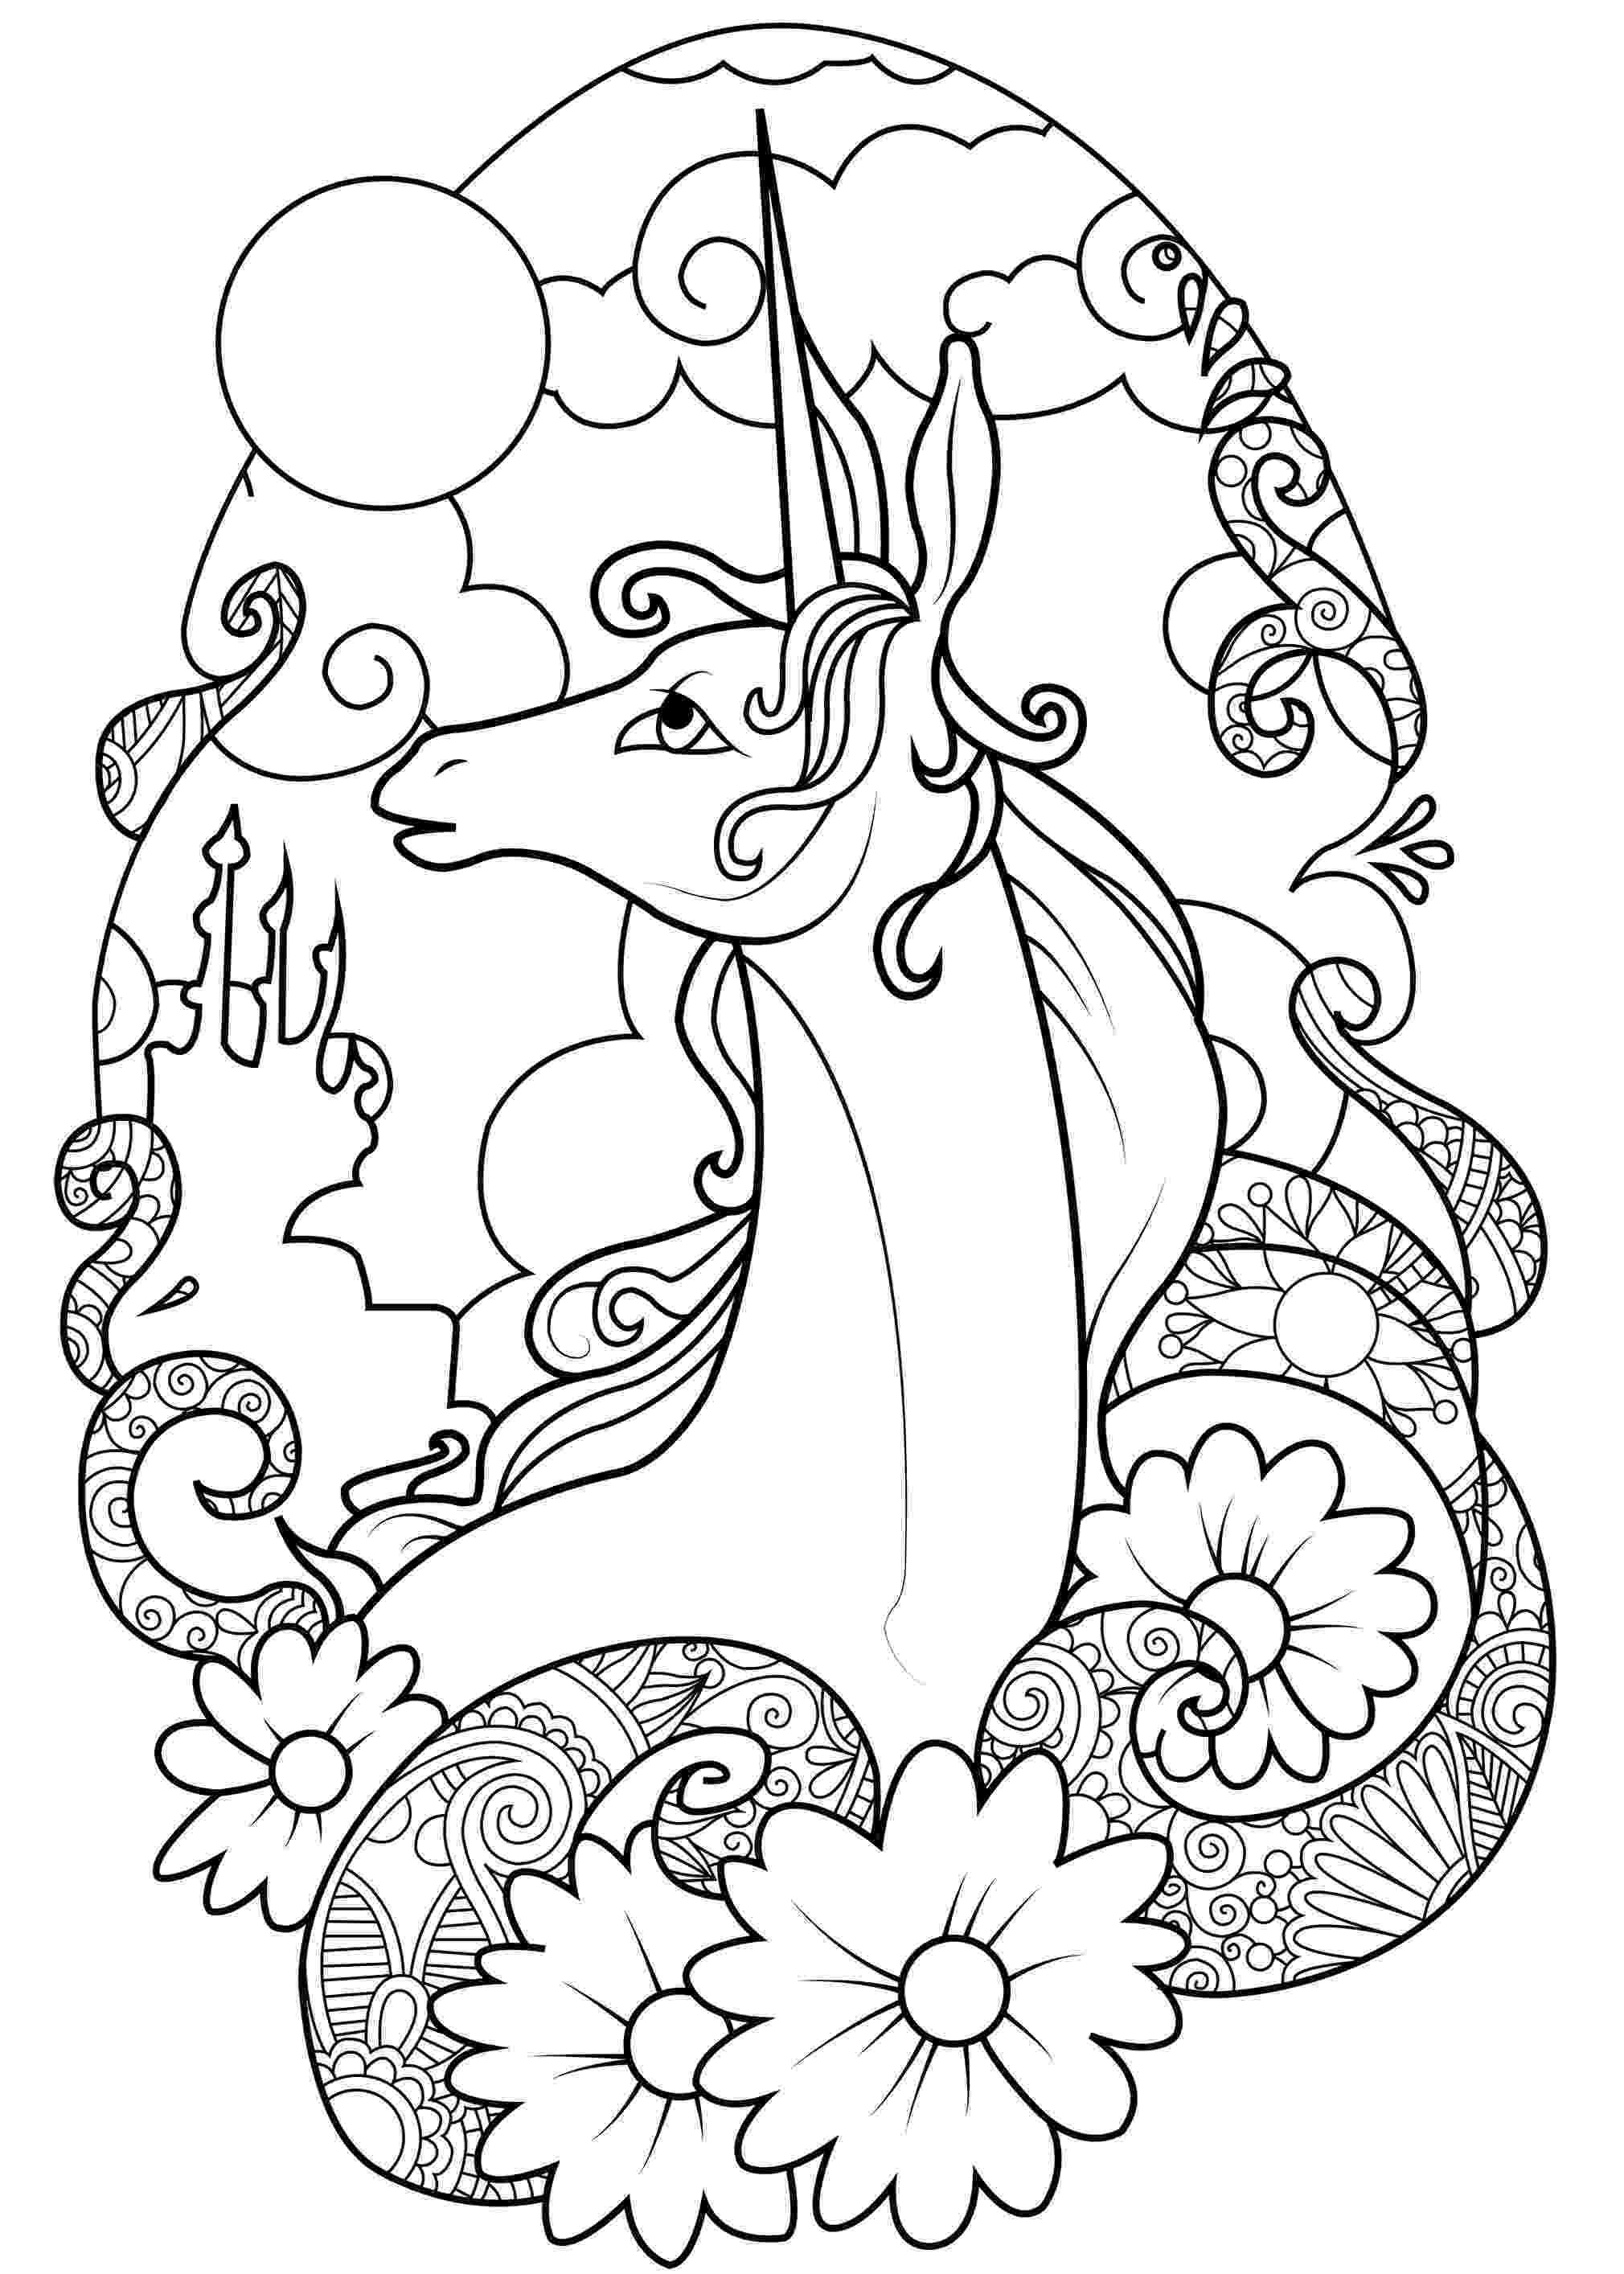 coloring page unicorn fairy unicorn unicorns adult coloring pages unicorn page coloring